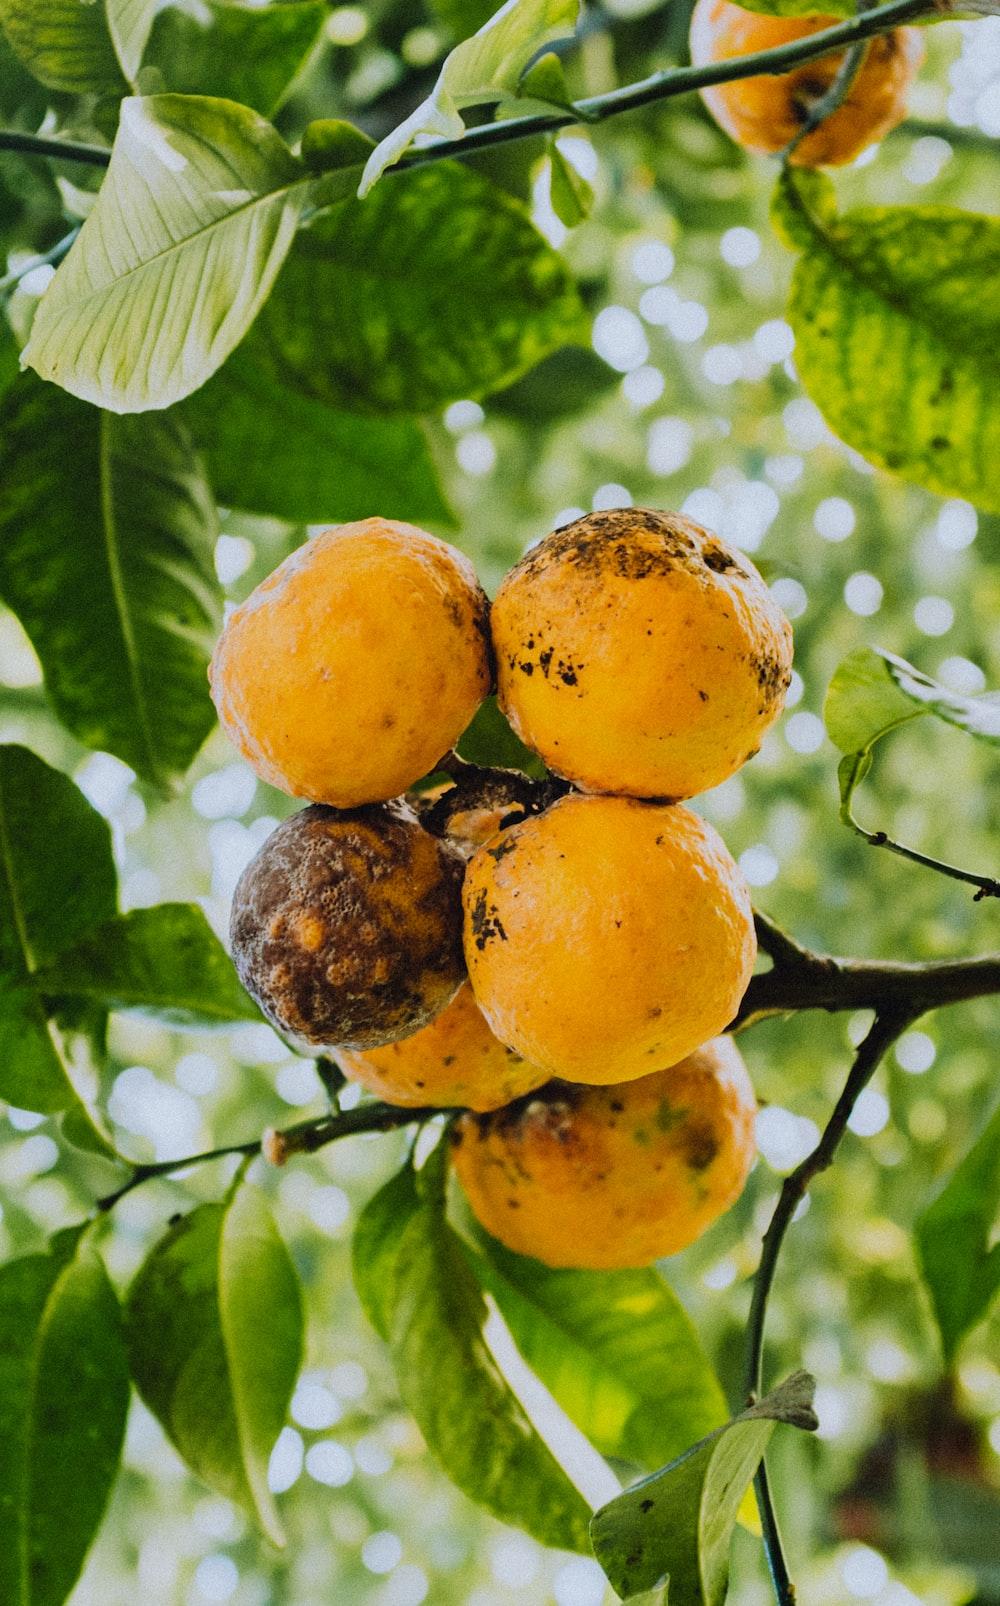 orange fruit on tree branch